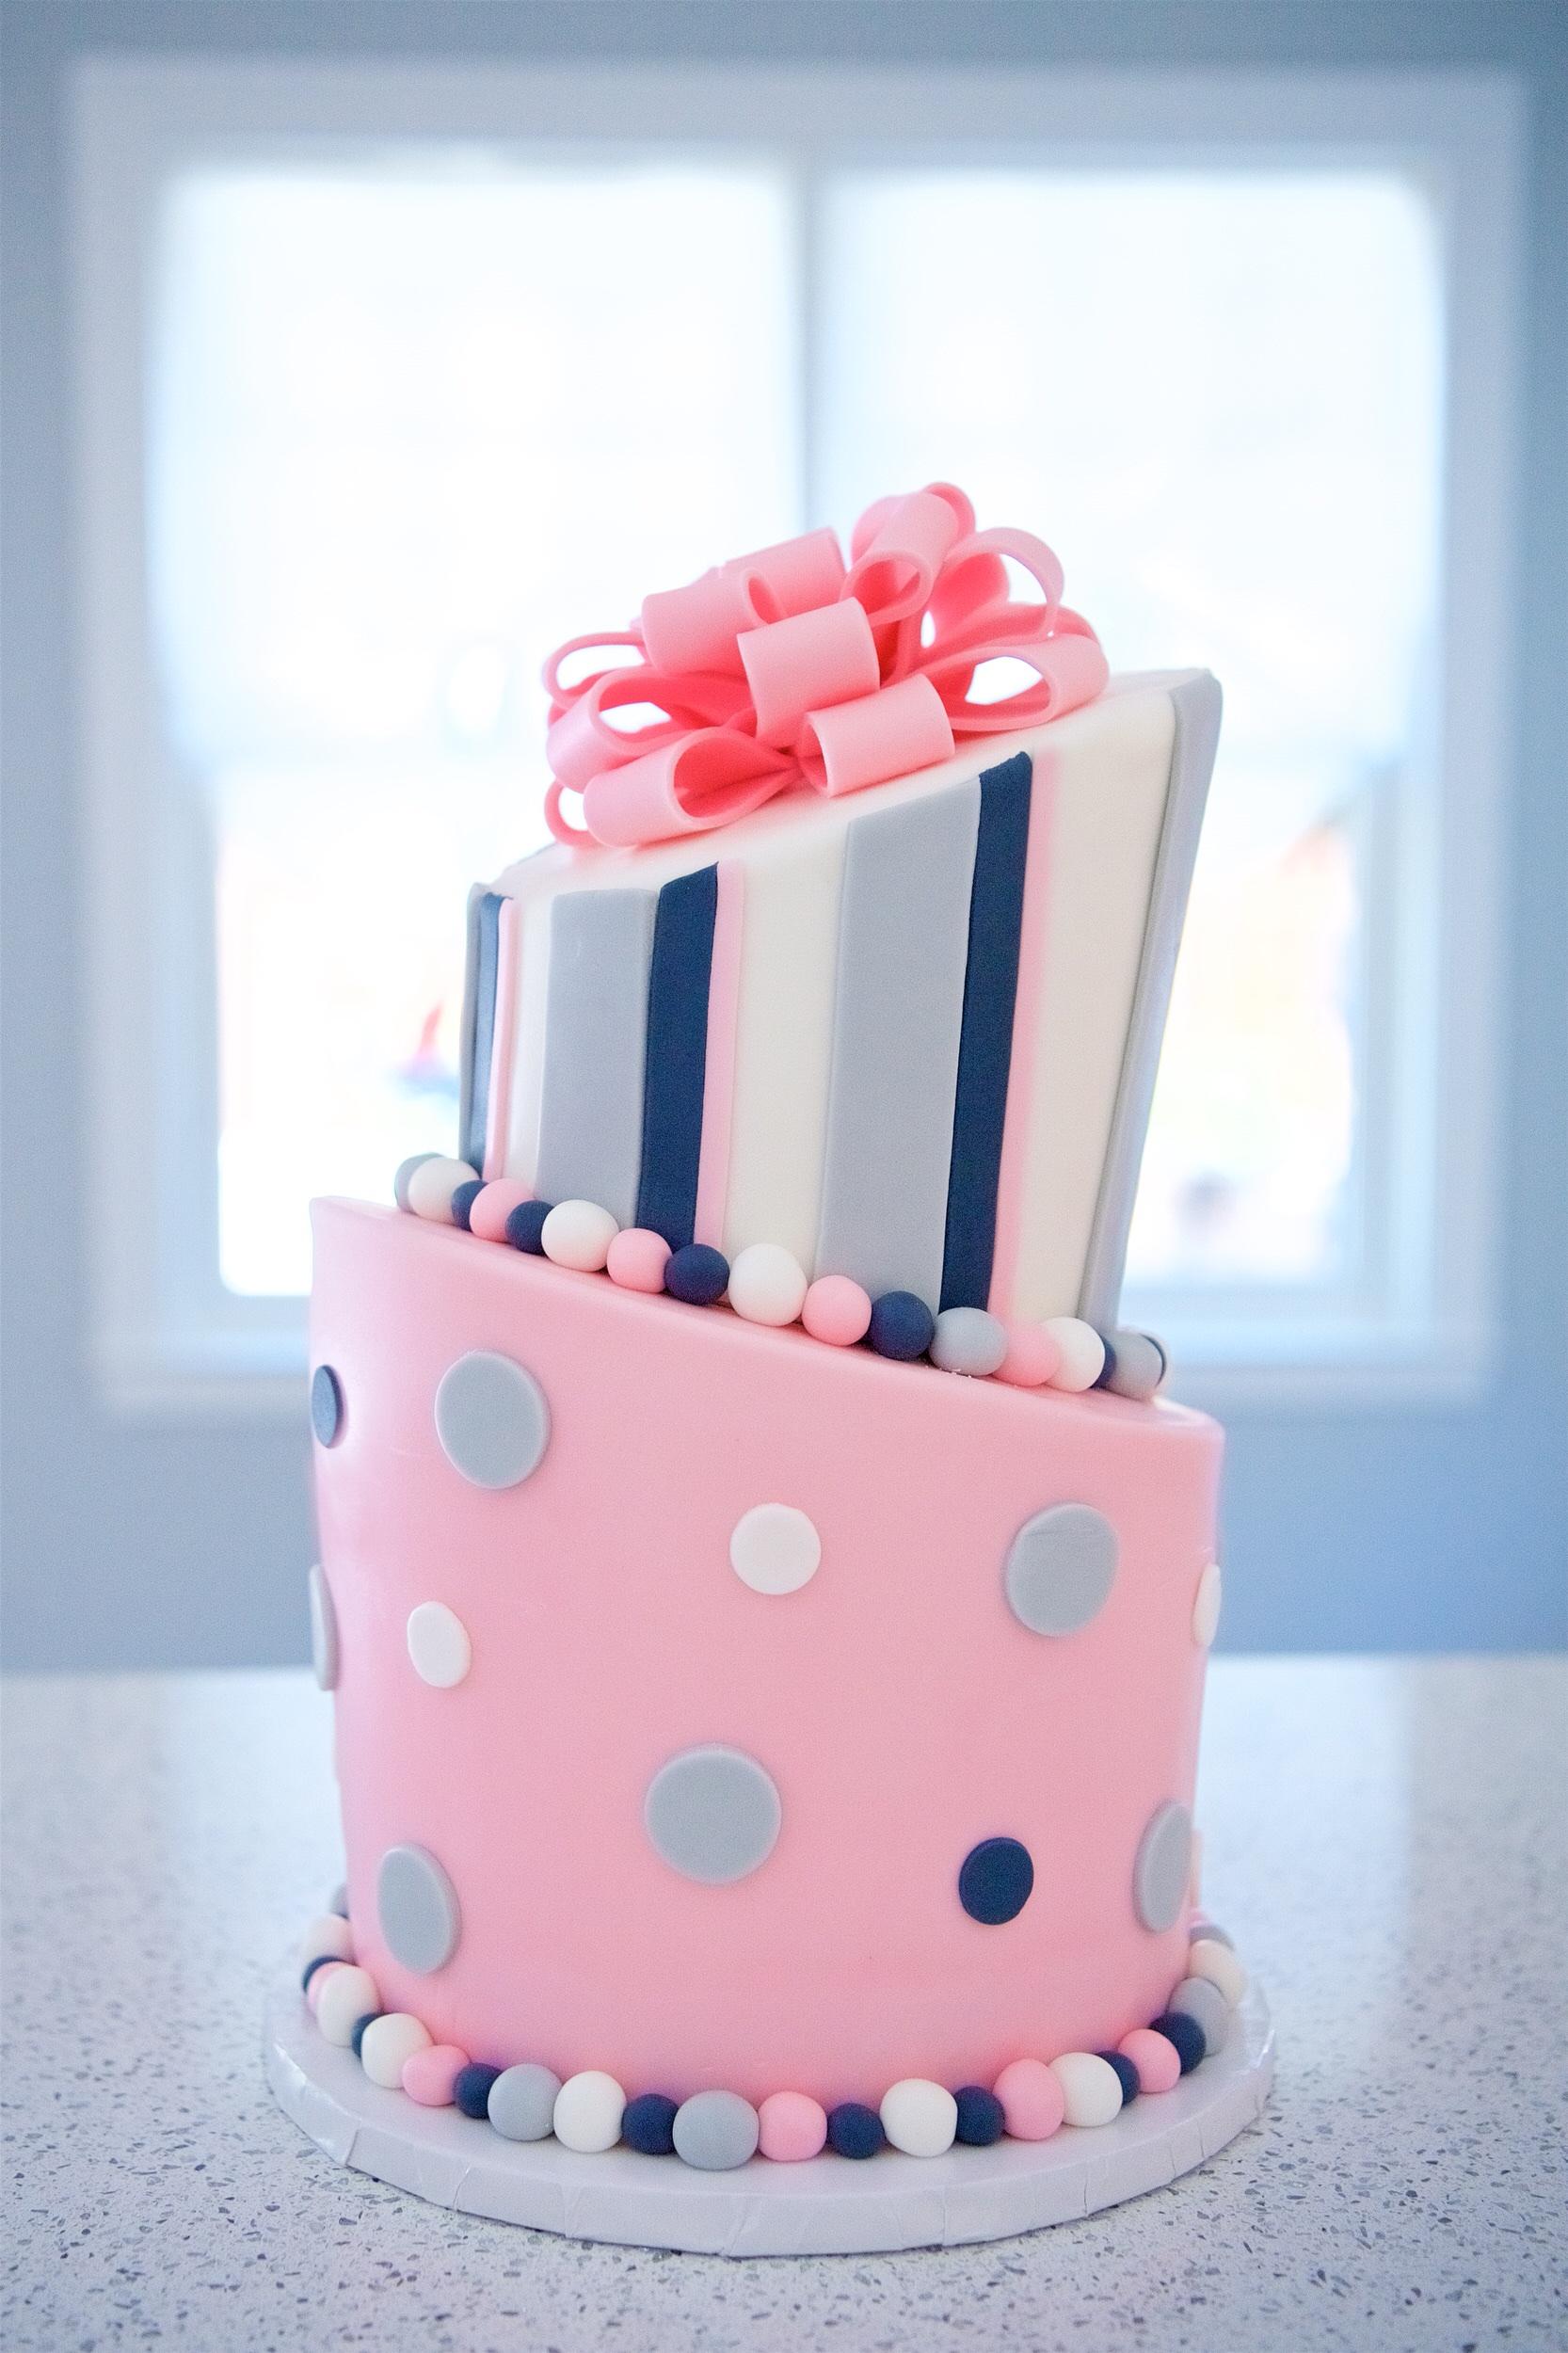 cake-005.jpg